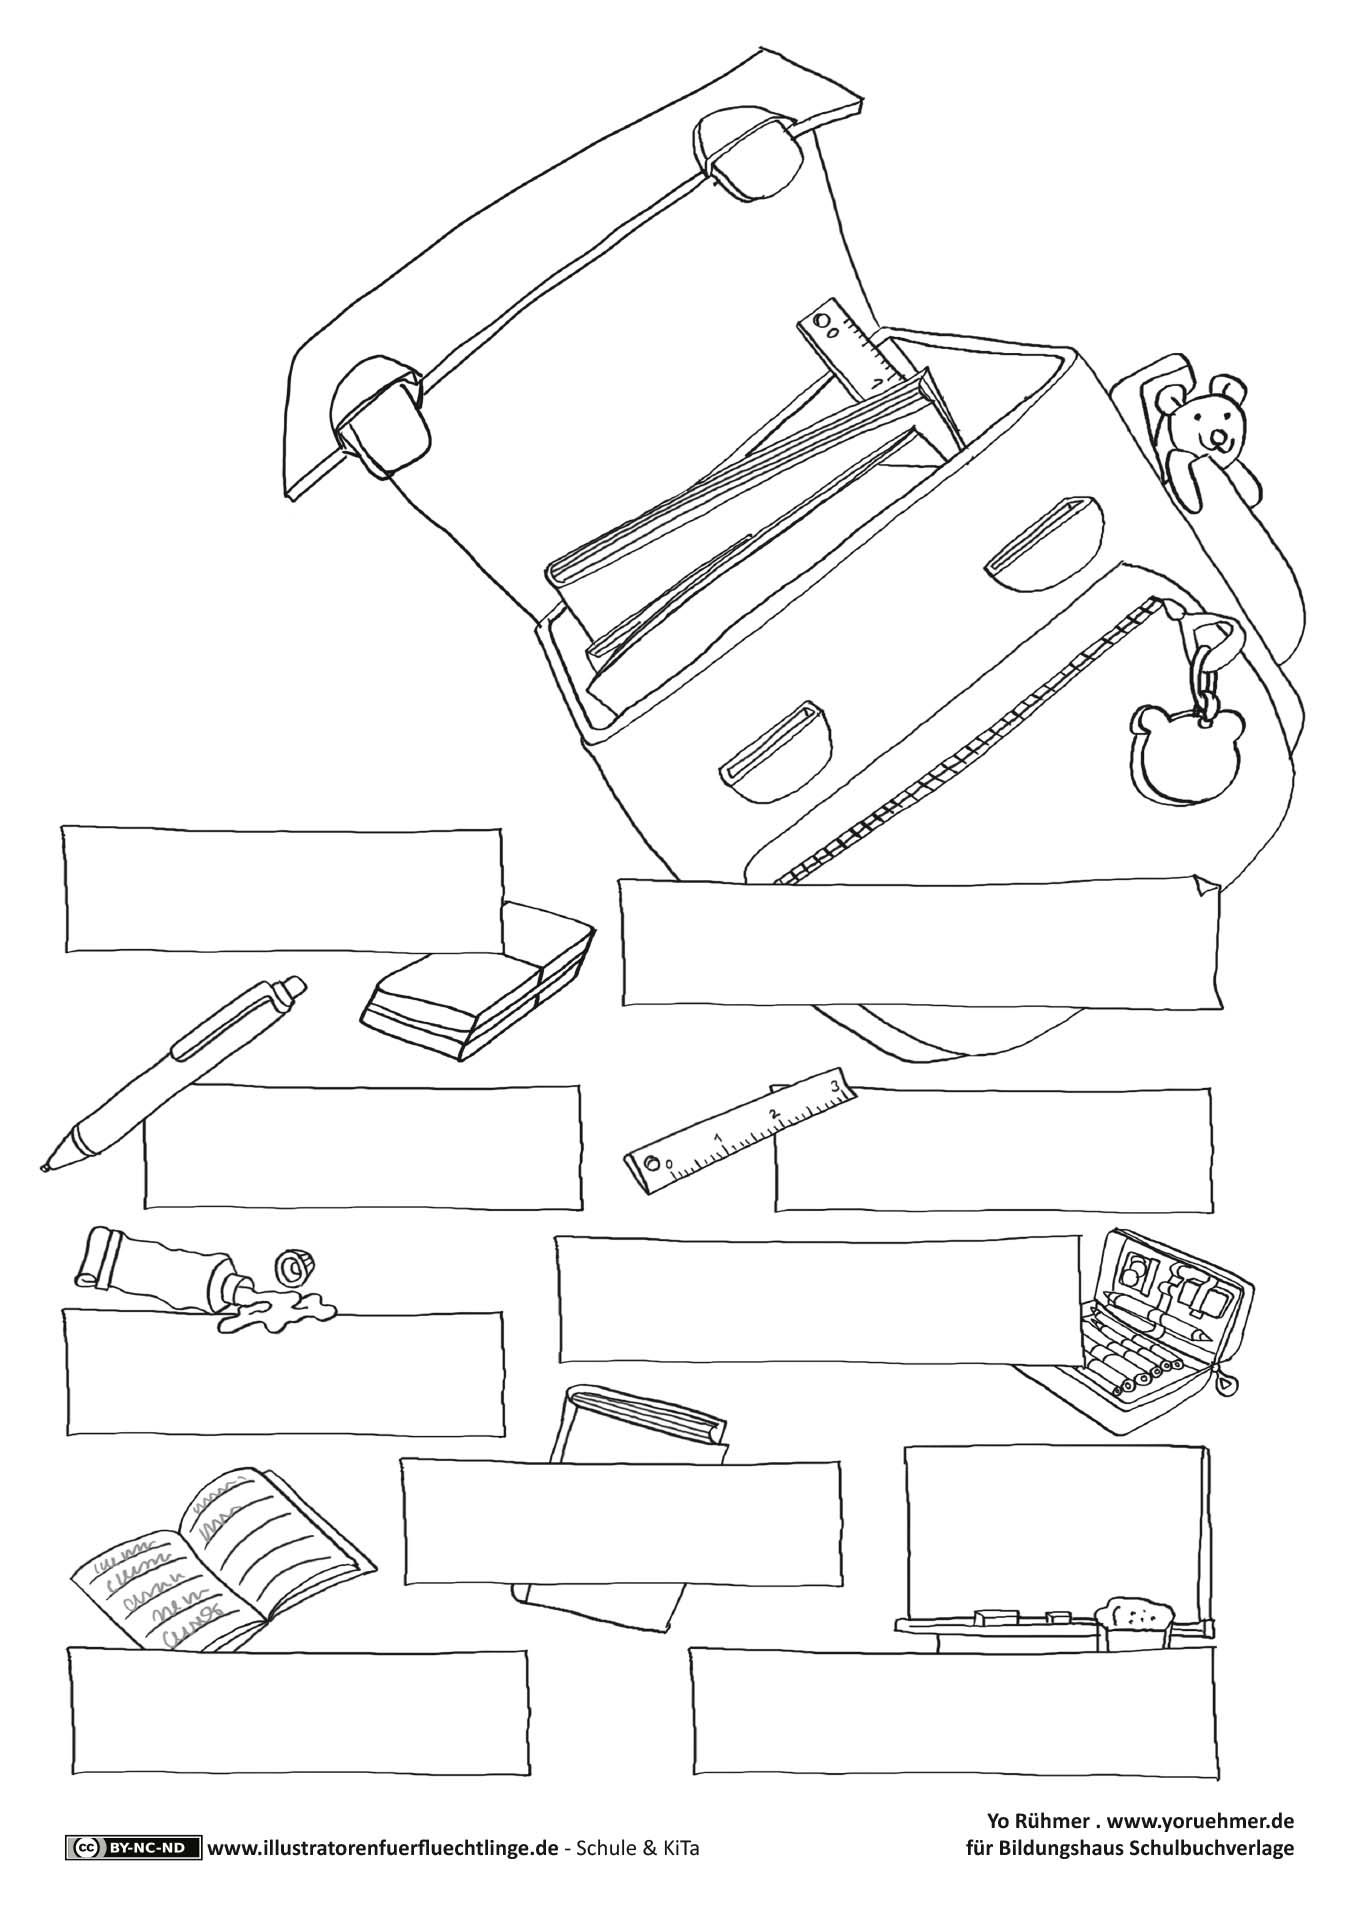 download als pdf schule und kita schulsachen ranzen r hmer schulsachen. Black Bedroom Furniture Sets. Home Design Ideas